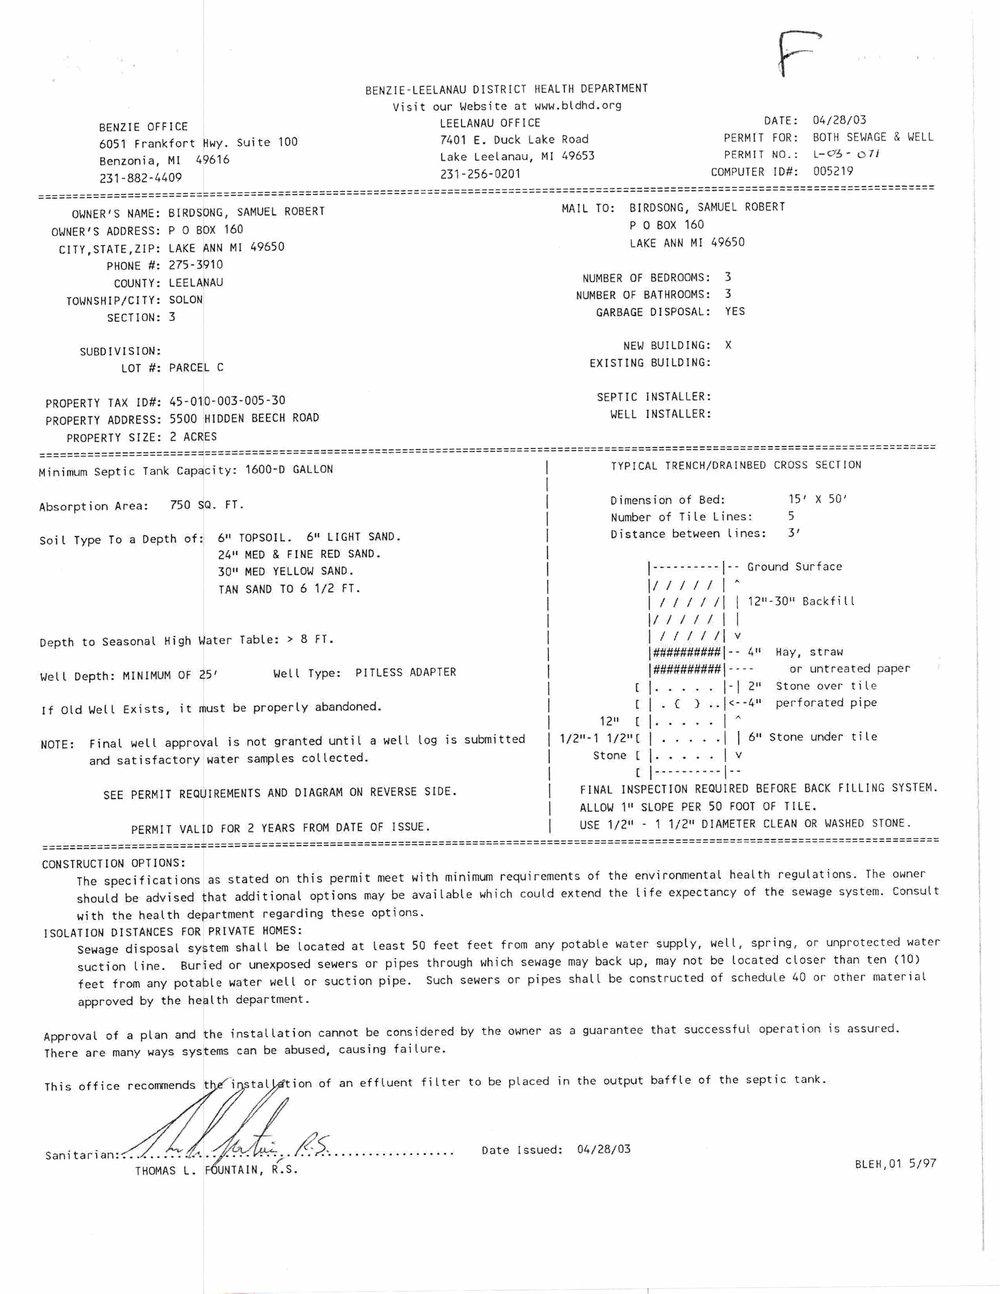 5500 E Hidden Beech, Cedar, MI - For sale by Oltersdorf Realty LLC - Marketing Packet (18).jpg